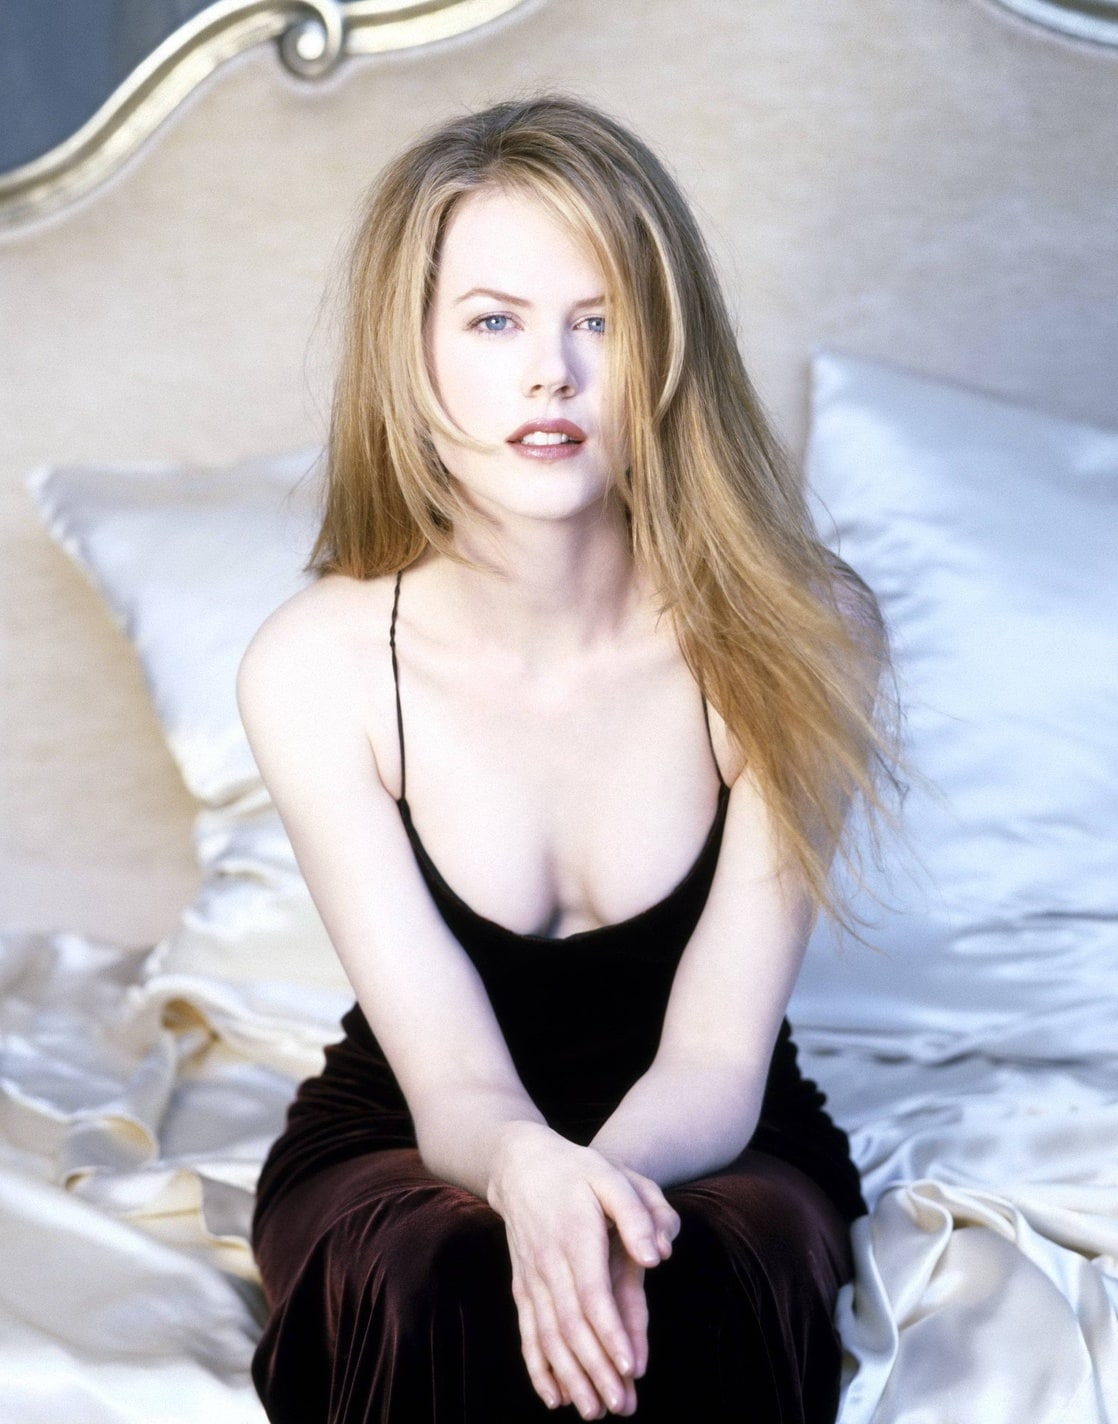 Nude Photos Of Nicole Kidman